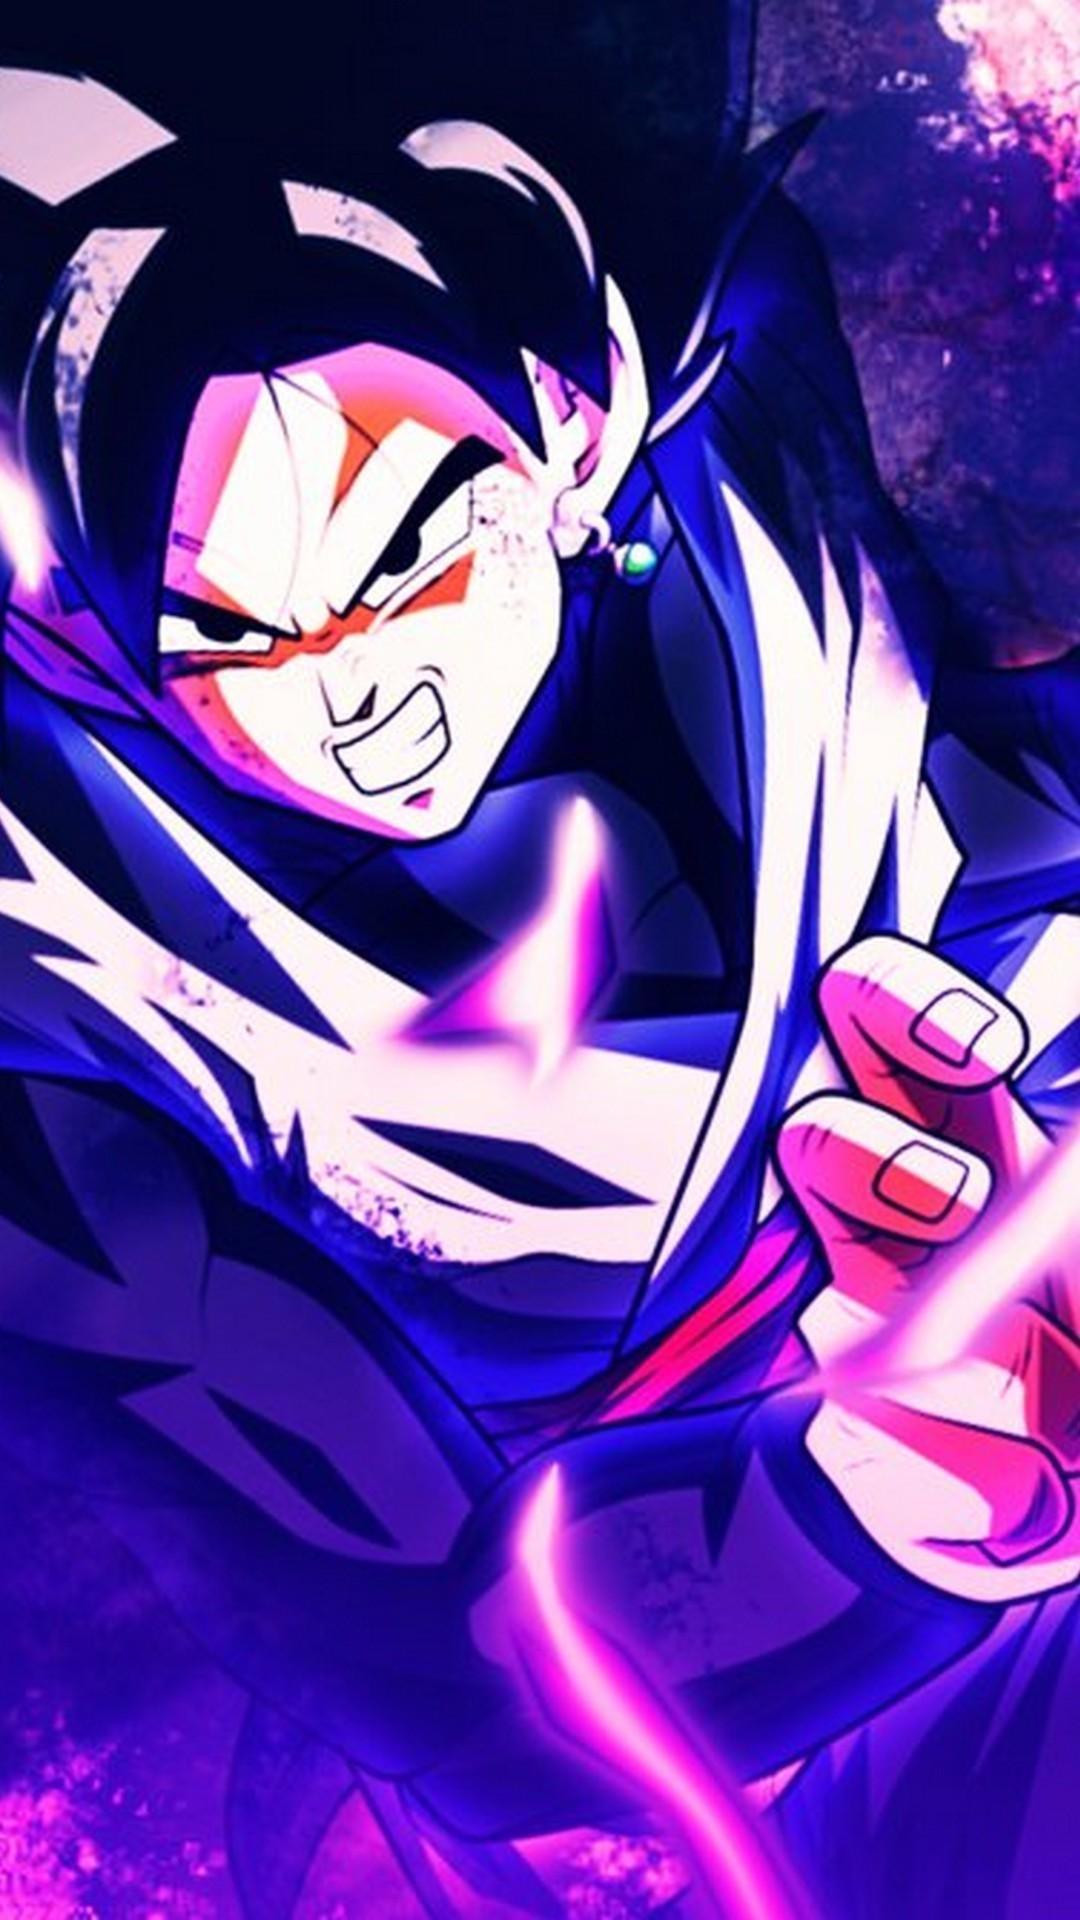 Goku Black Supreme Wallpapers - Wallpaper Cave